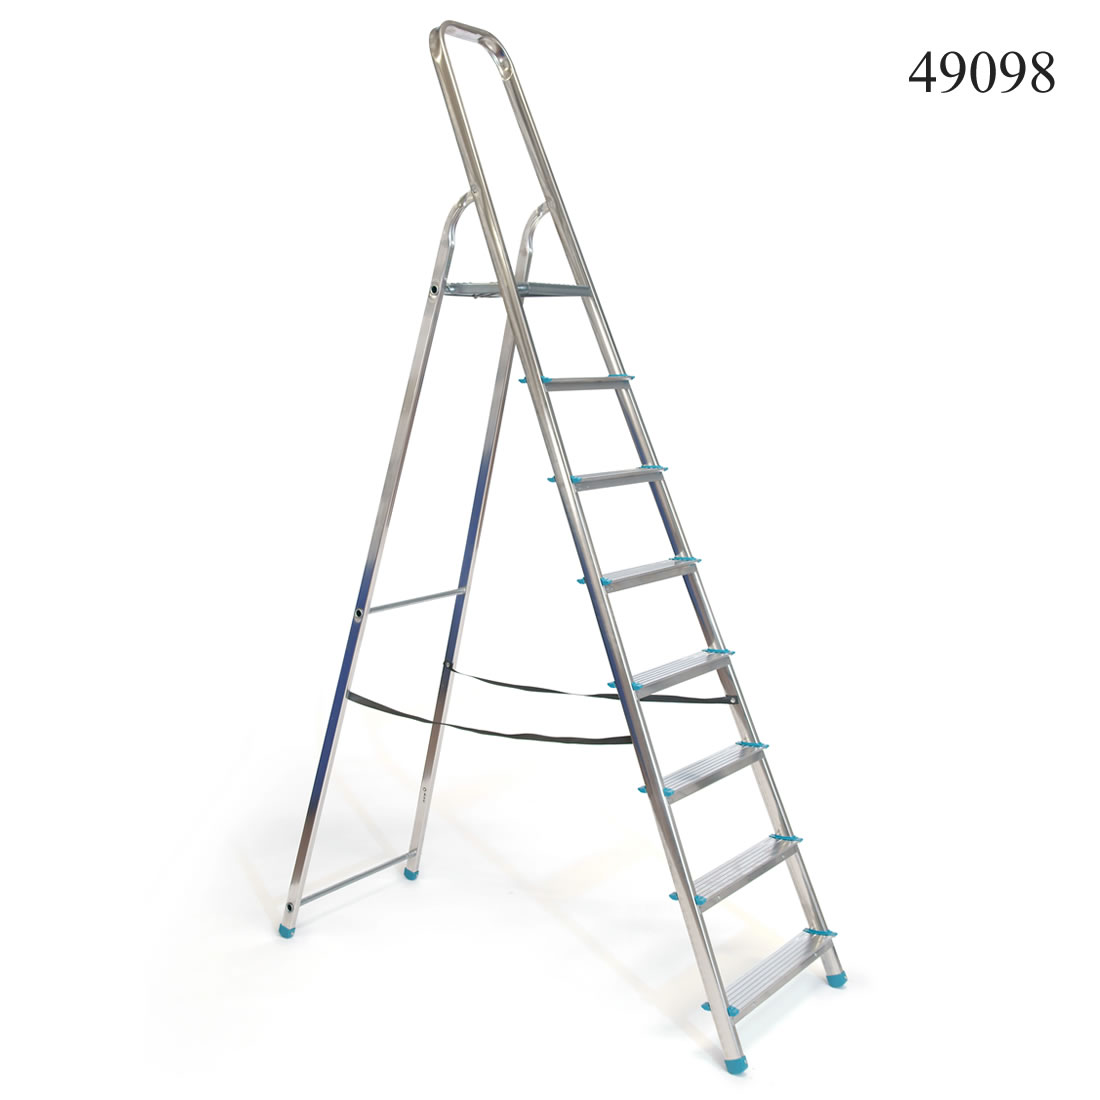 3,75m (model 49098)